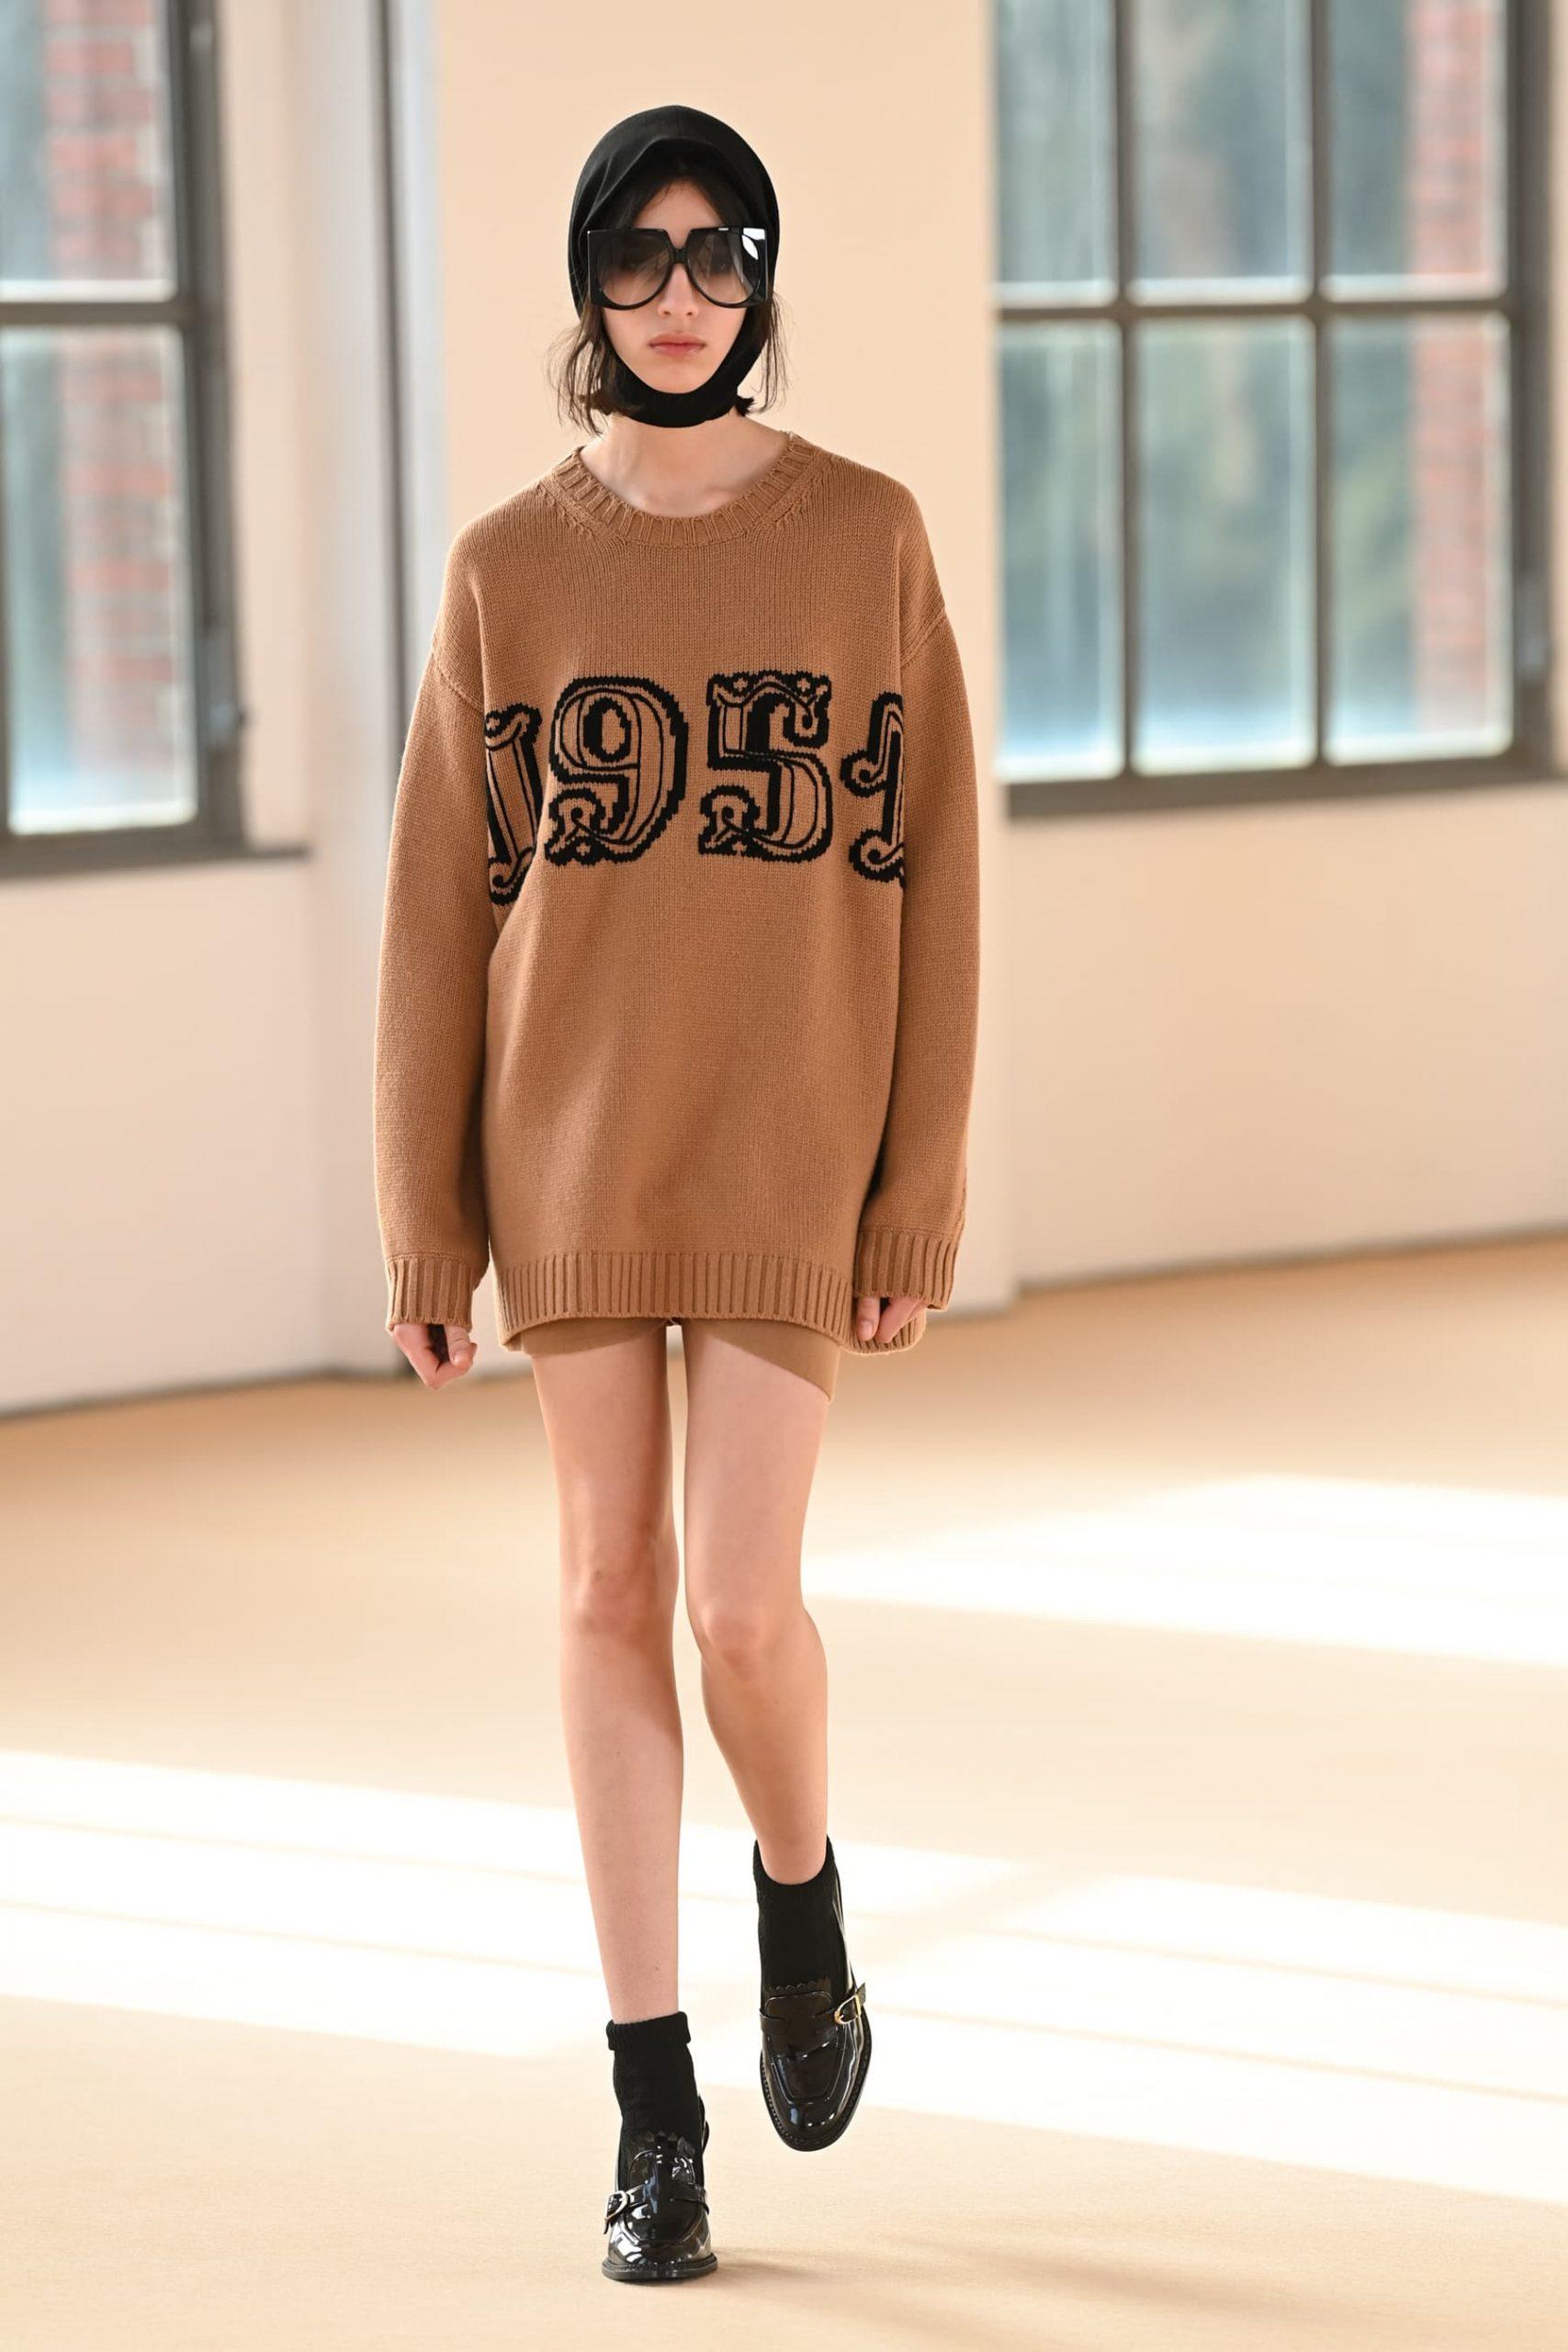 Max Mara Fall 2021 Fashion Show Review